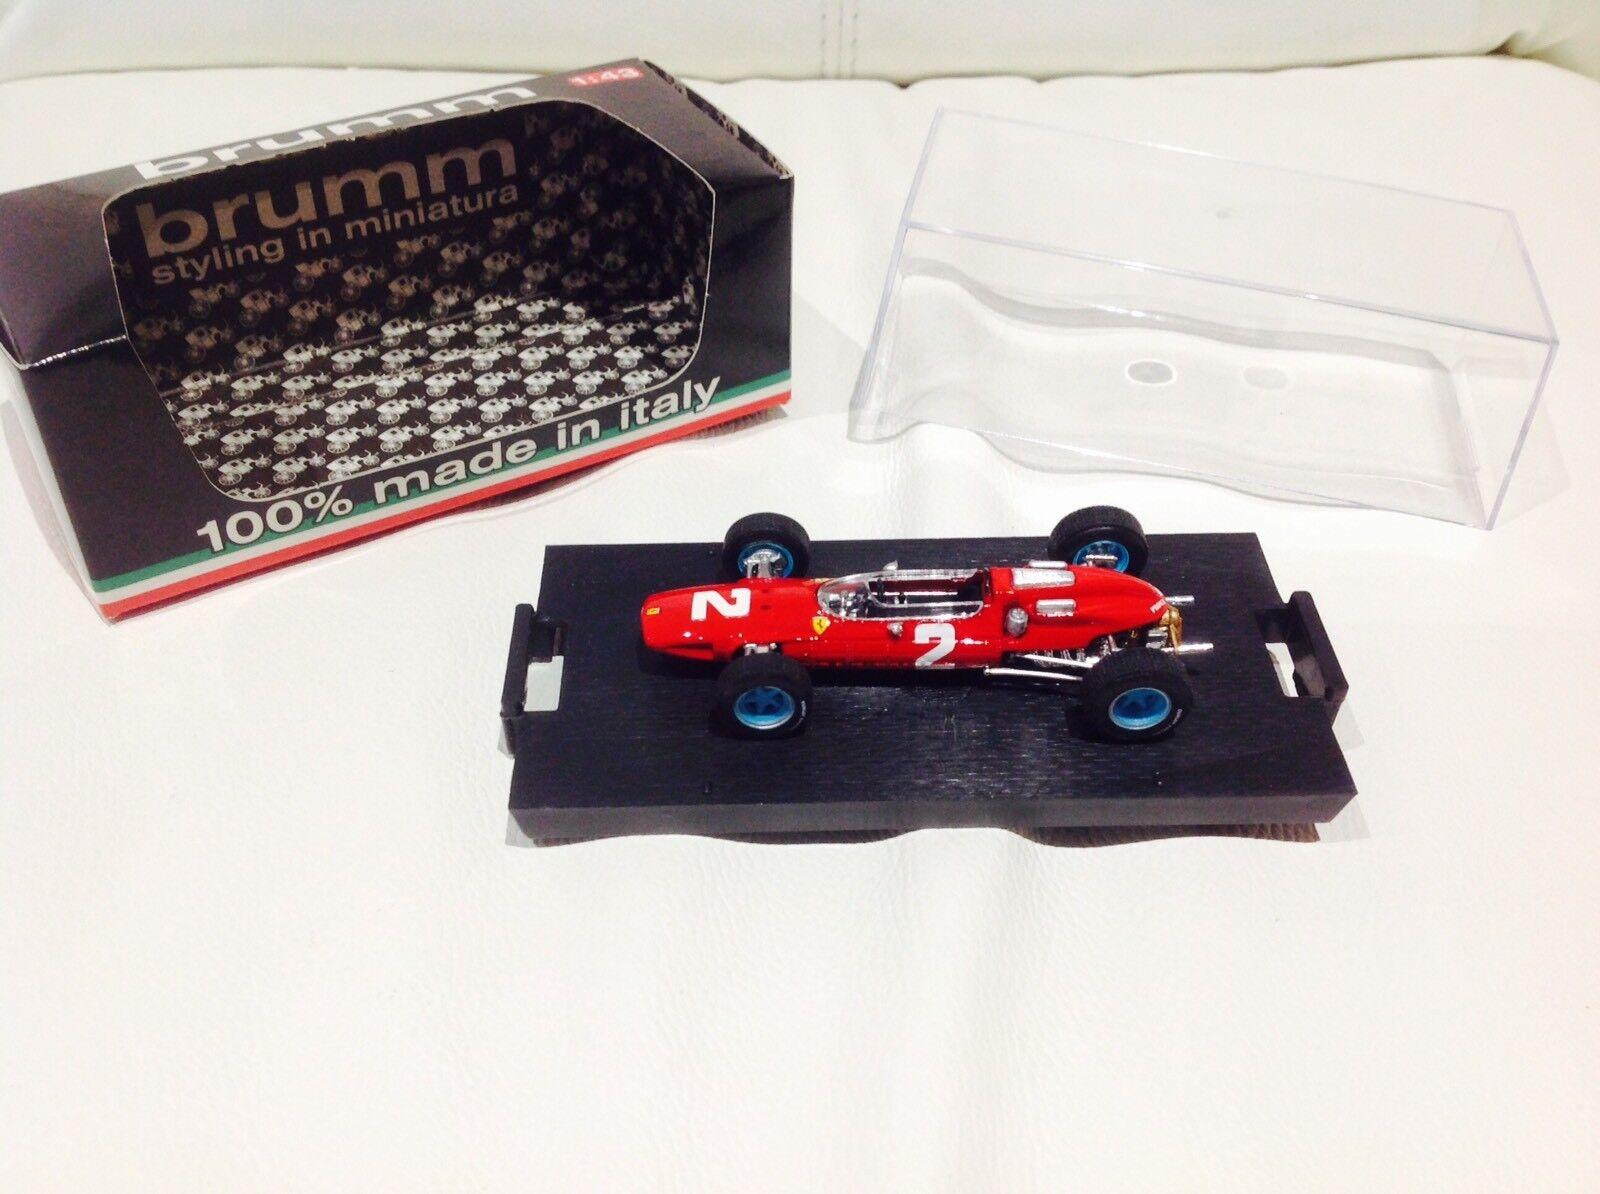 Brumm R290 Ferrari 158 Italian GP 1964 - John Surtees World Champion 1 43 Scale